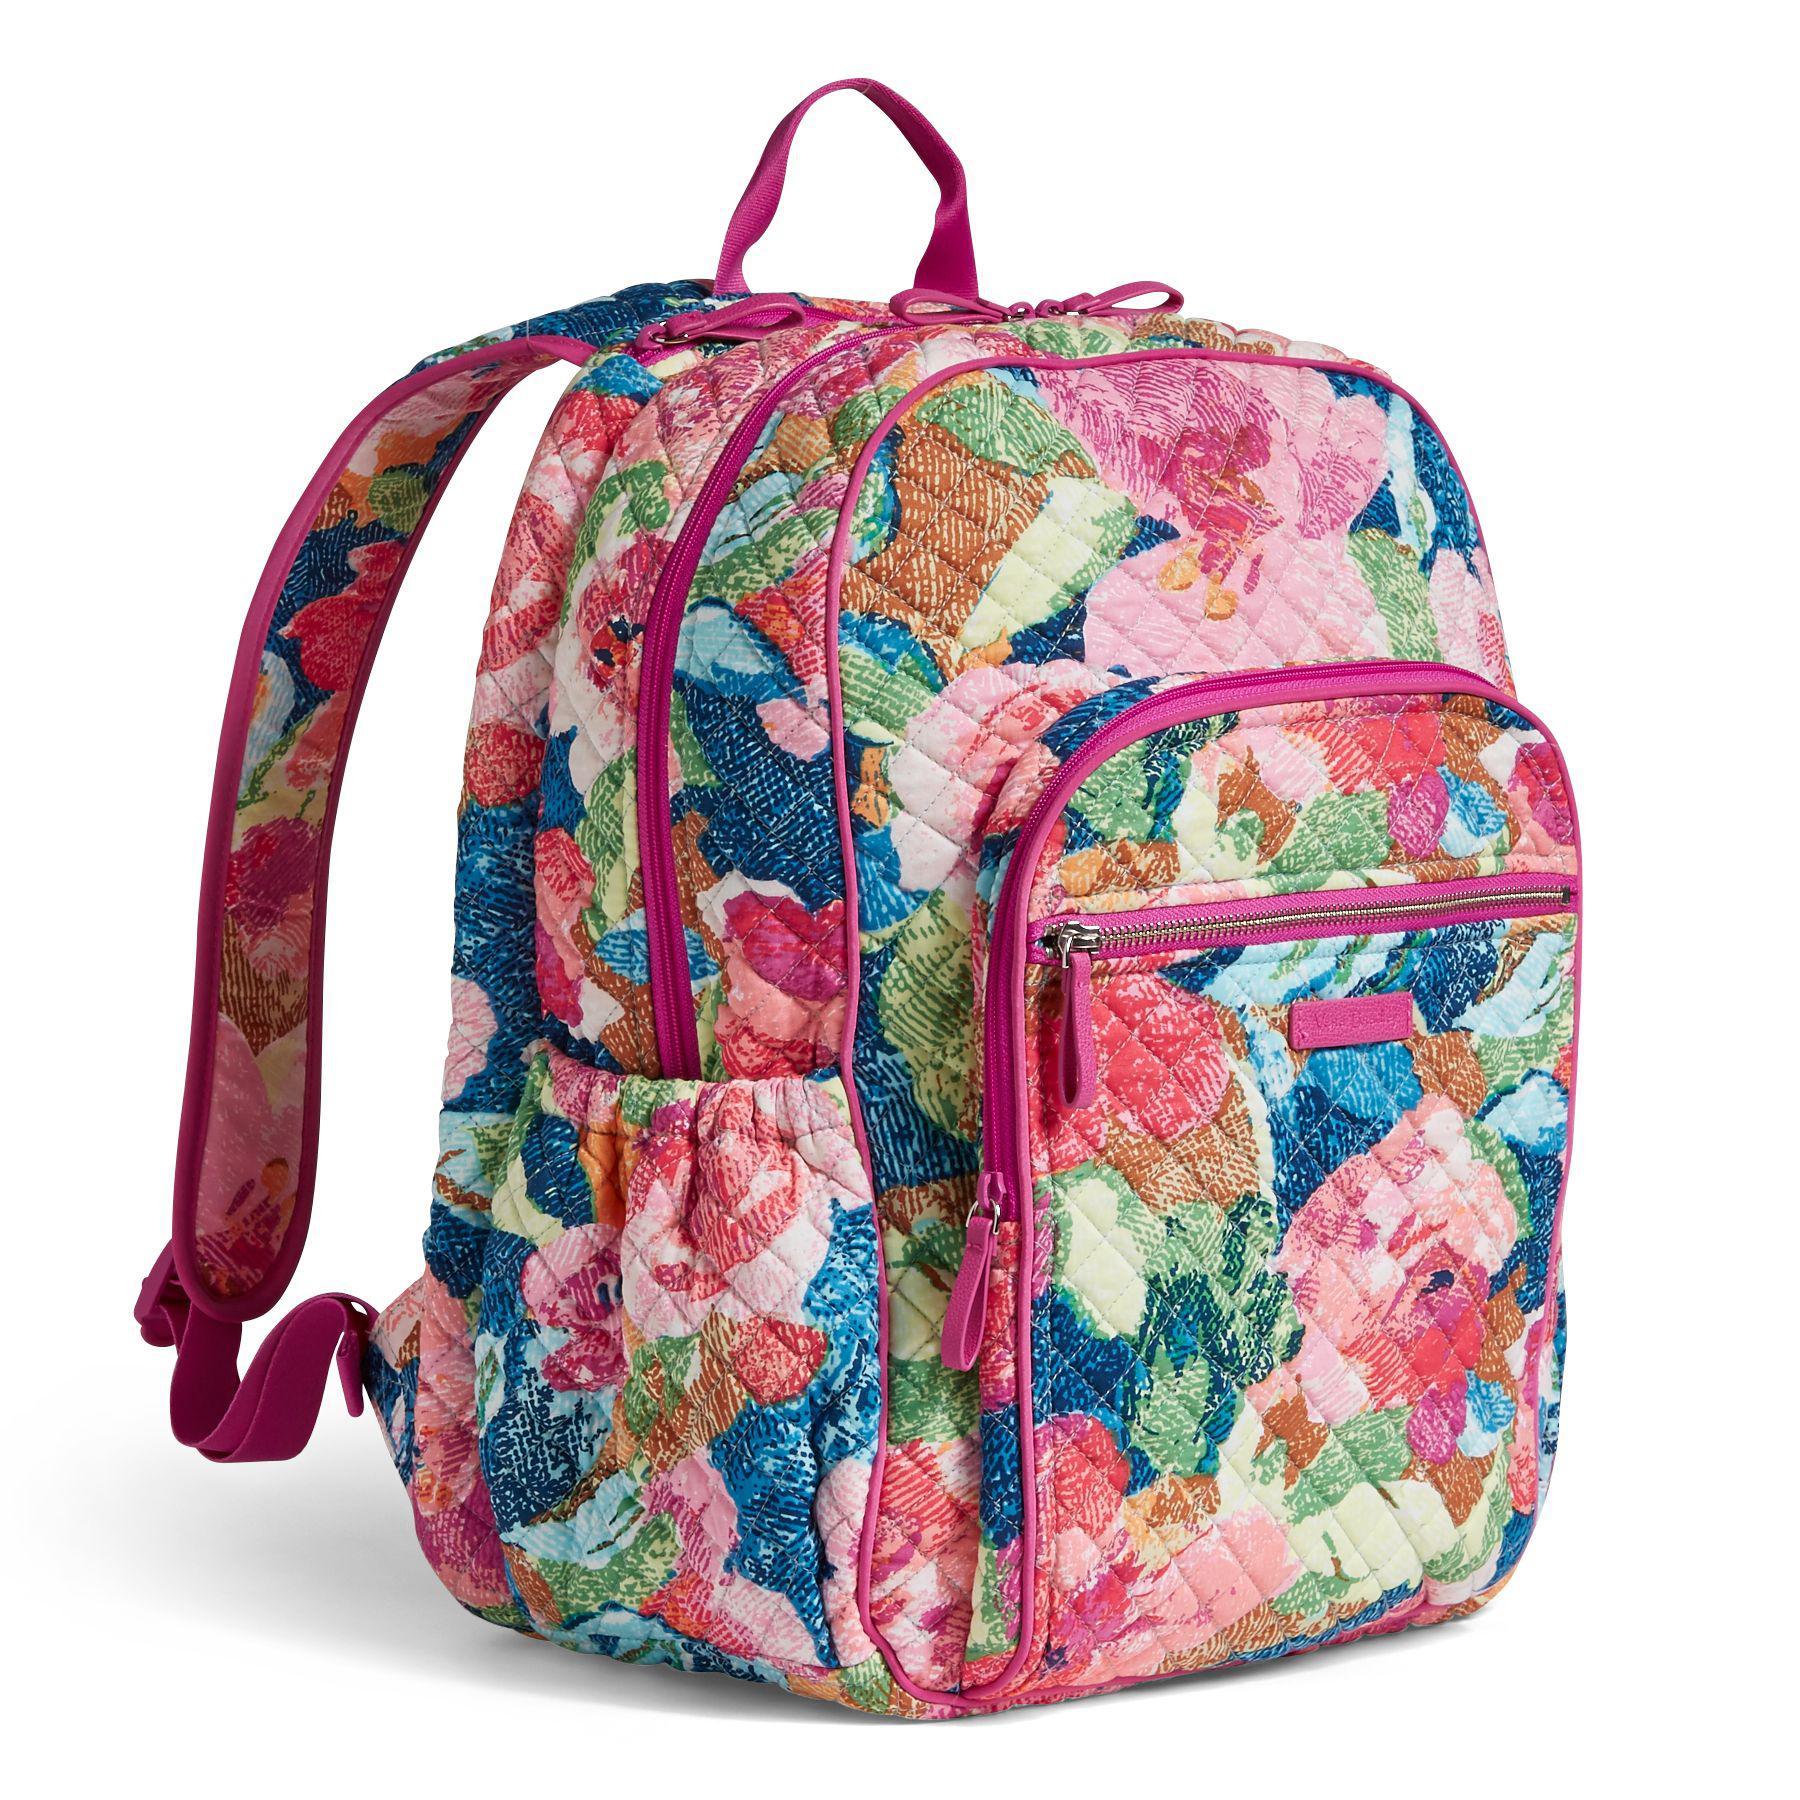 46a05133d9 Solid Pink Vera Bradley Backpack- Fenix Toulouse Handball